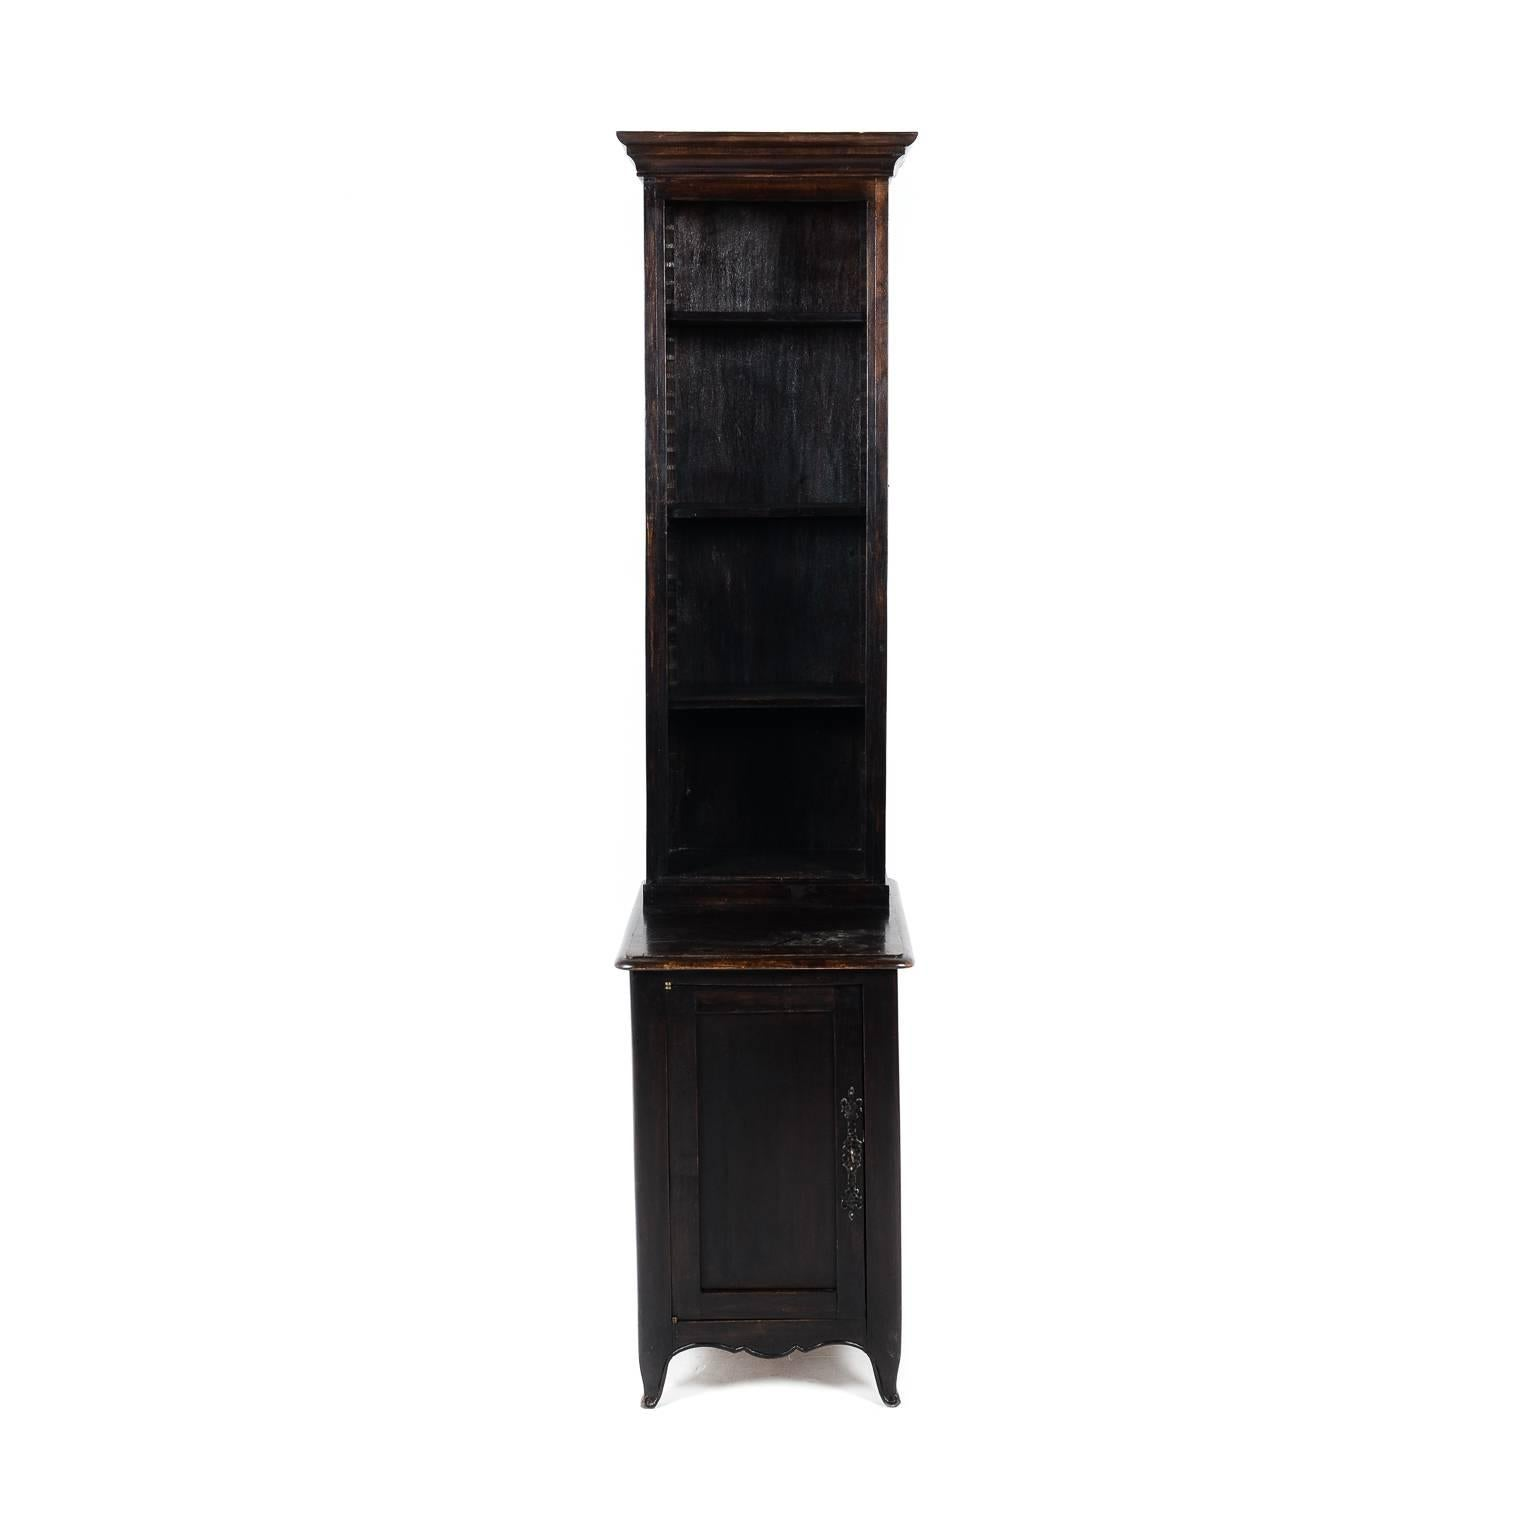 Antique French Unusually Narrow Dark Oak Bookcase Circa